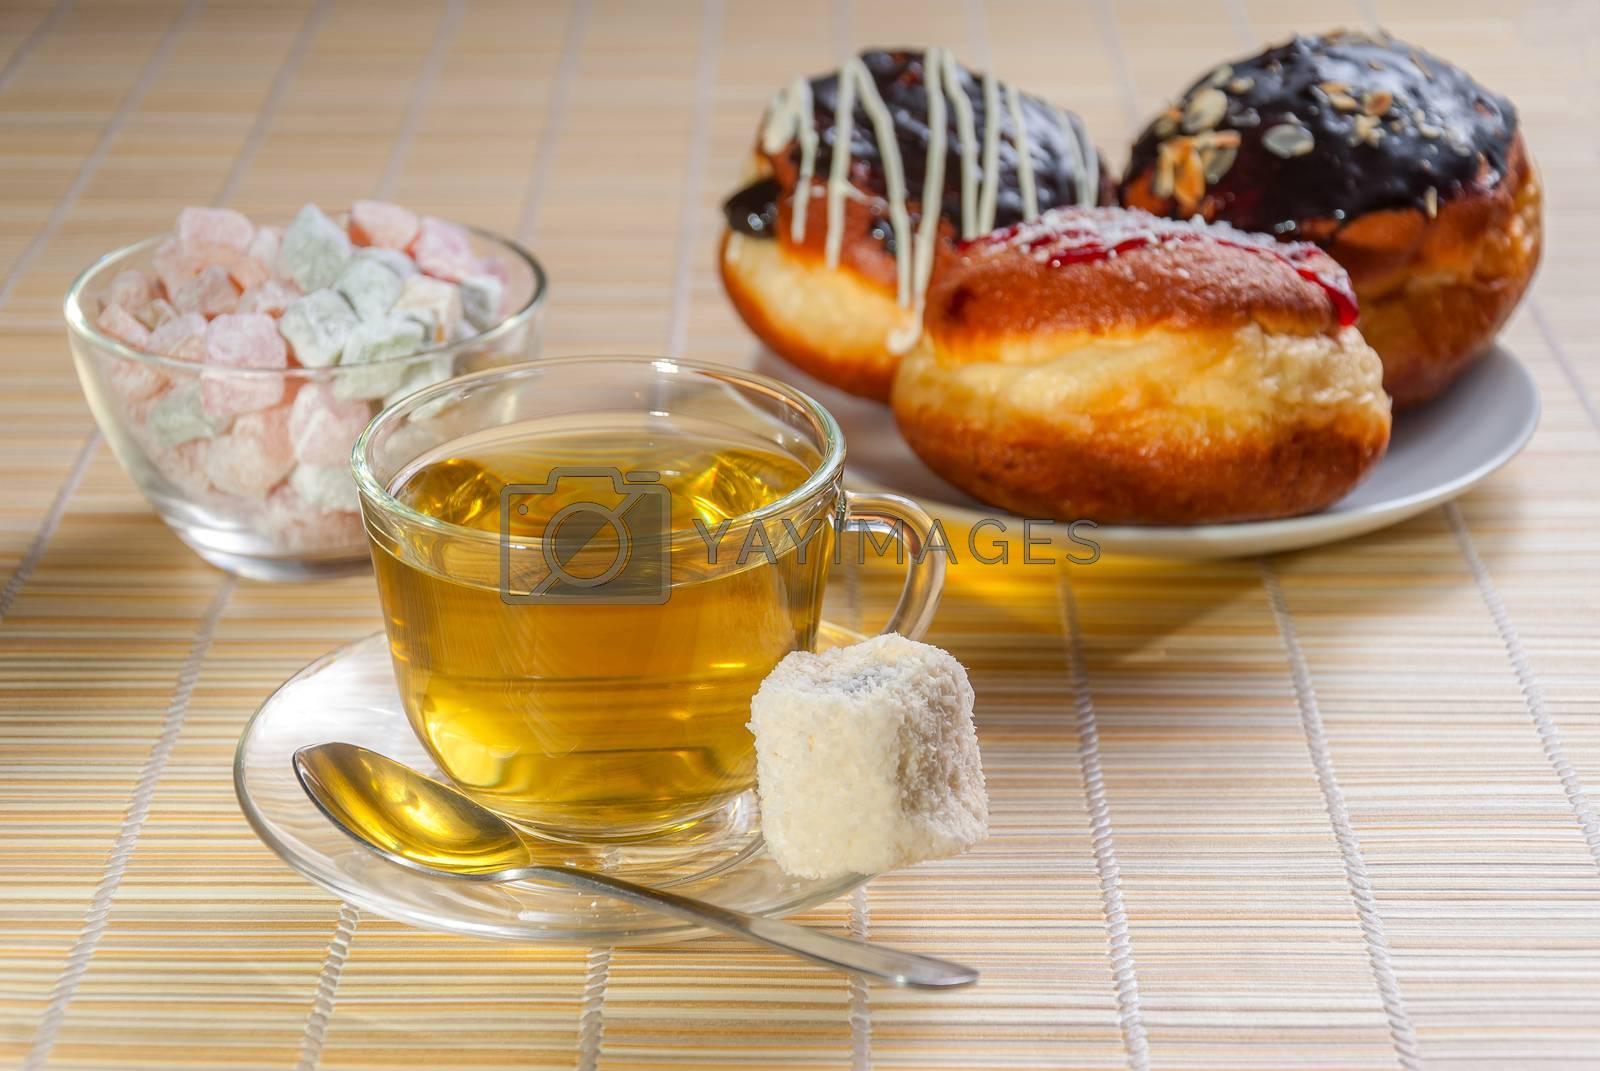 Green tea, fresh cherry muffin, colorful delight and doughnut, sweet dessert